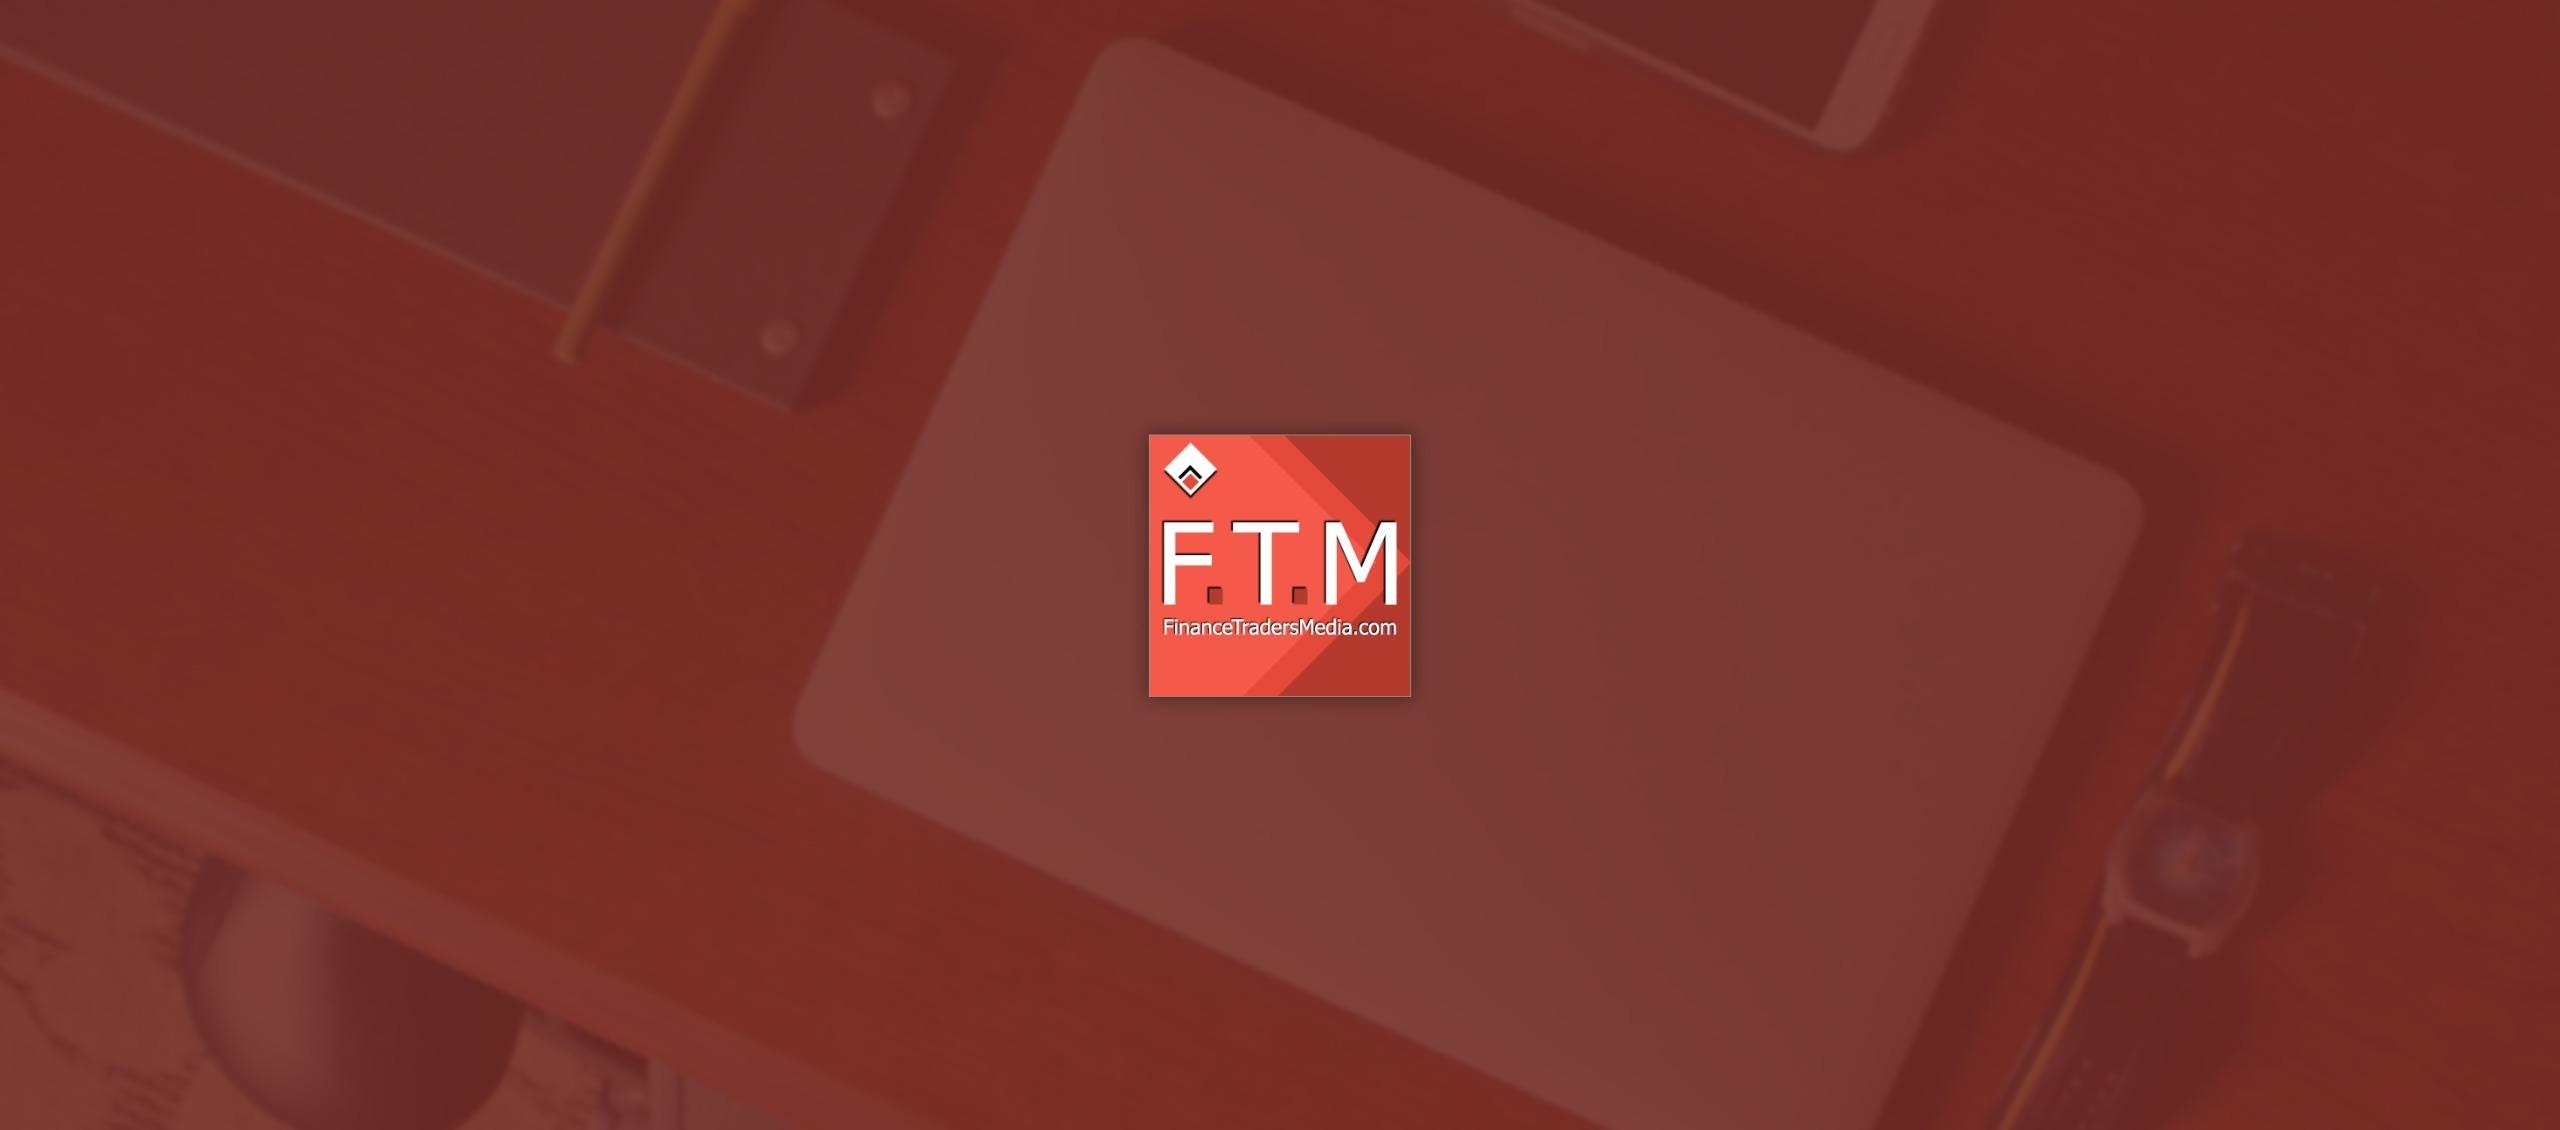 Finance Traders Media (@financetradersmedia) Cover Image